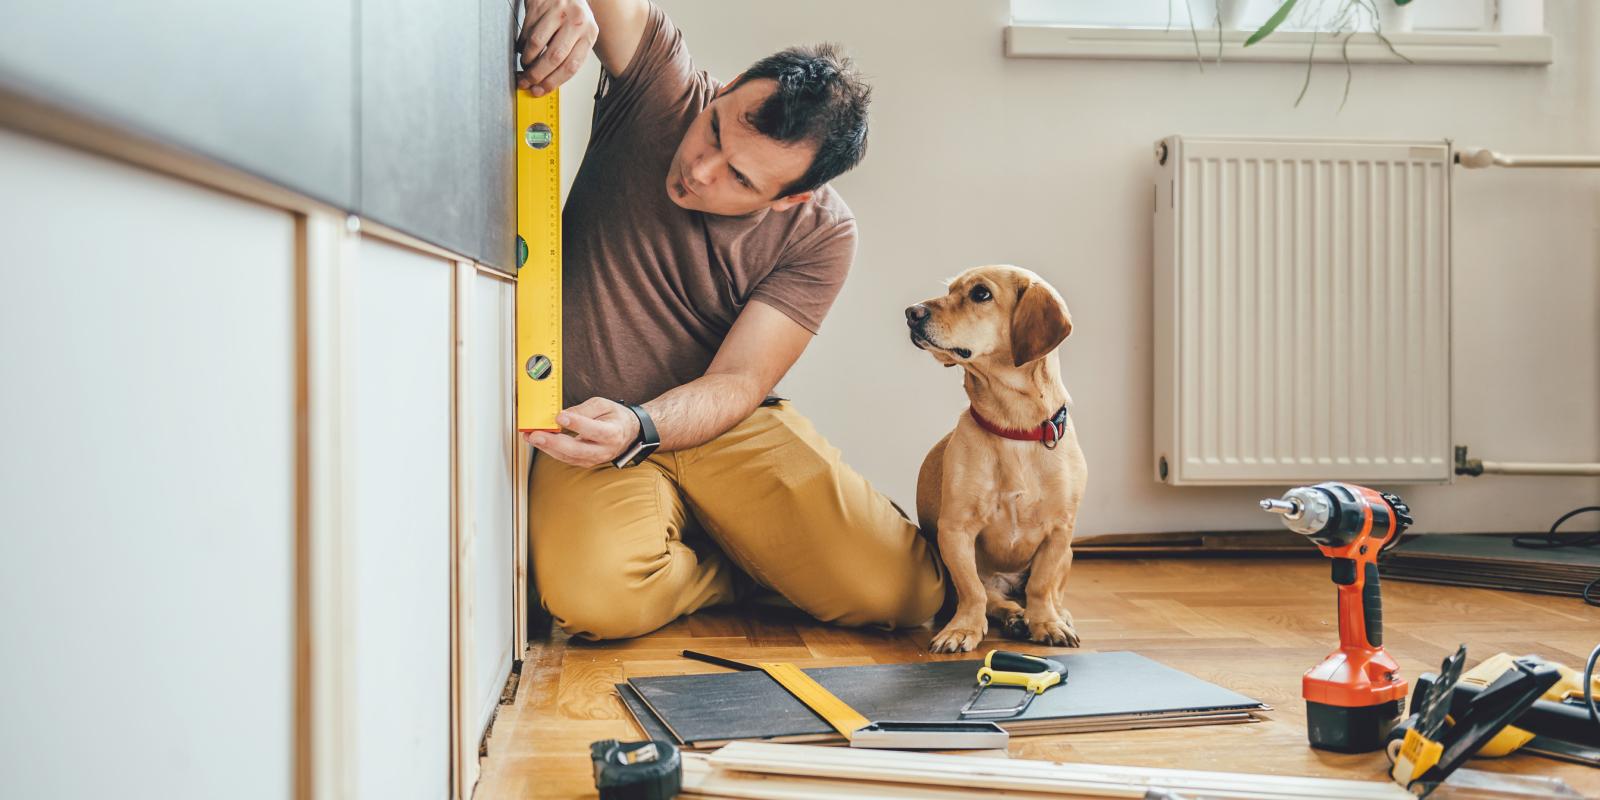 dog next to a man conducting home renovations